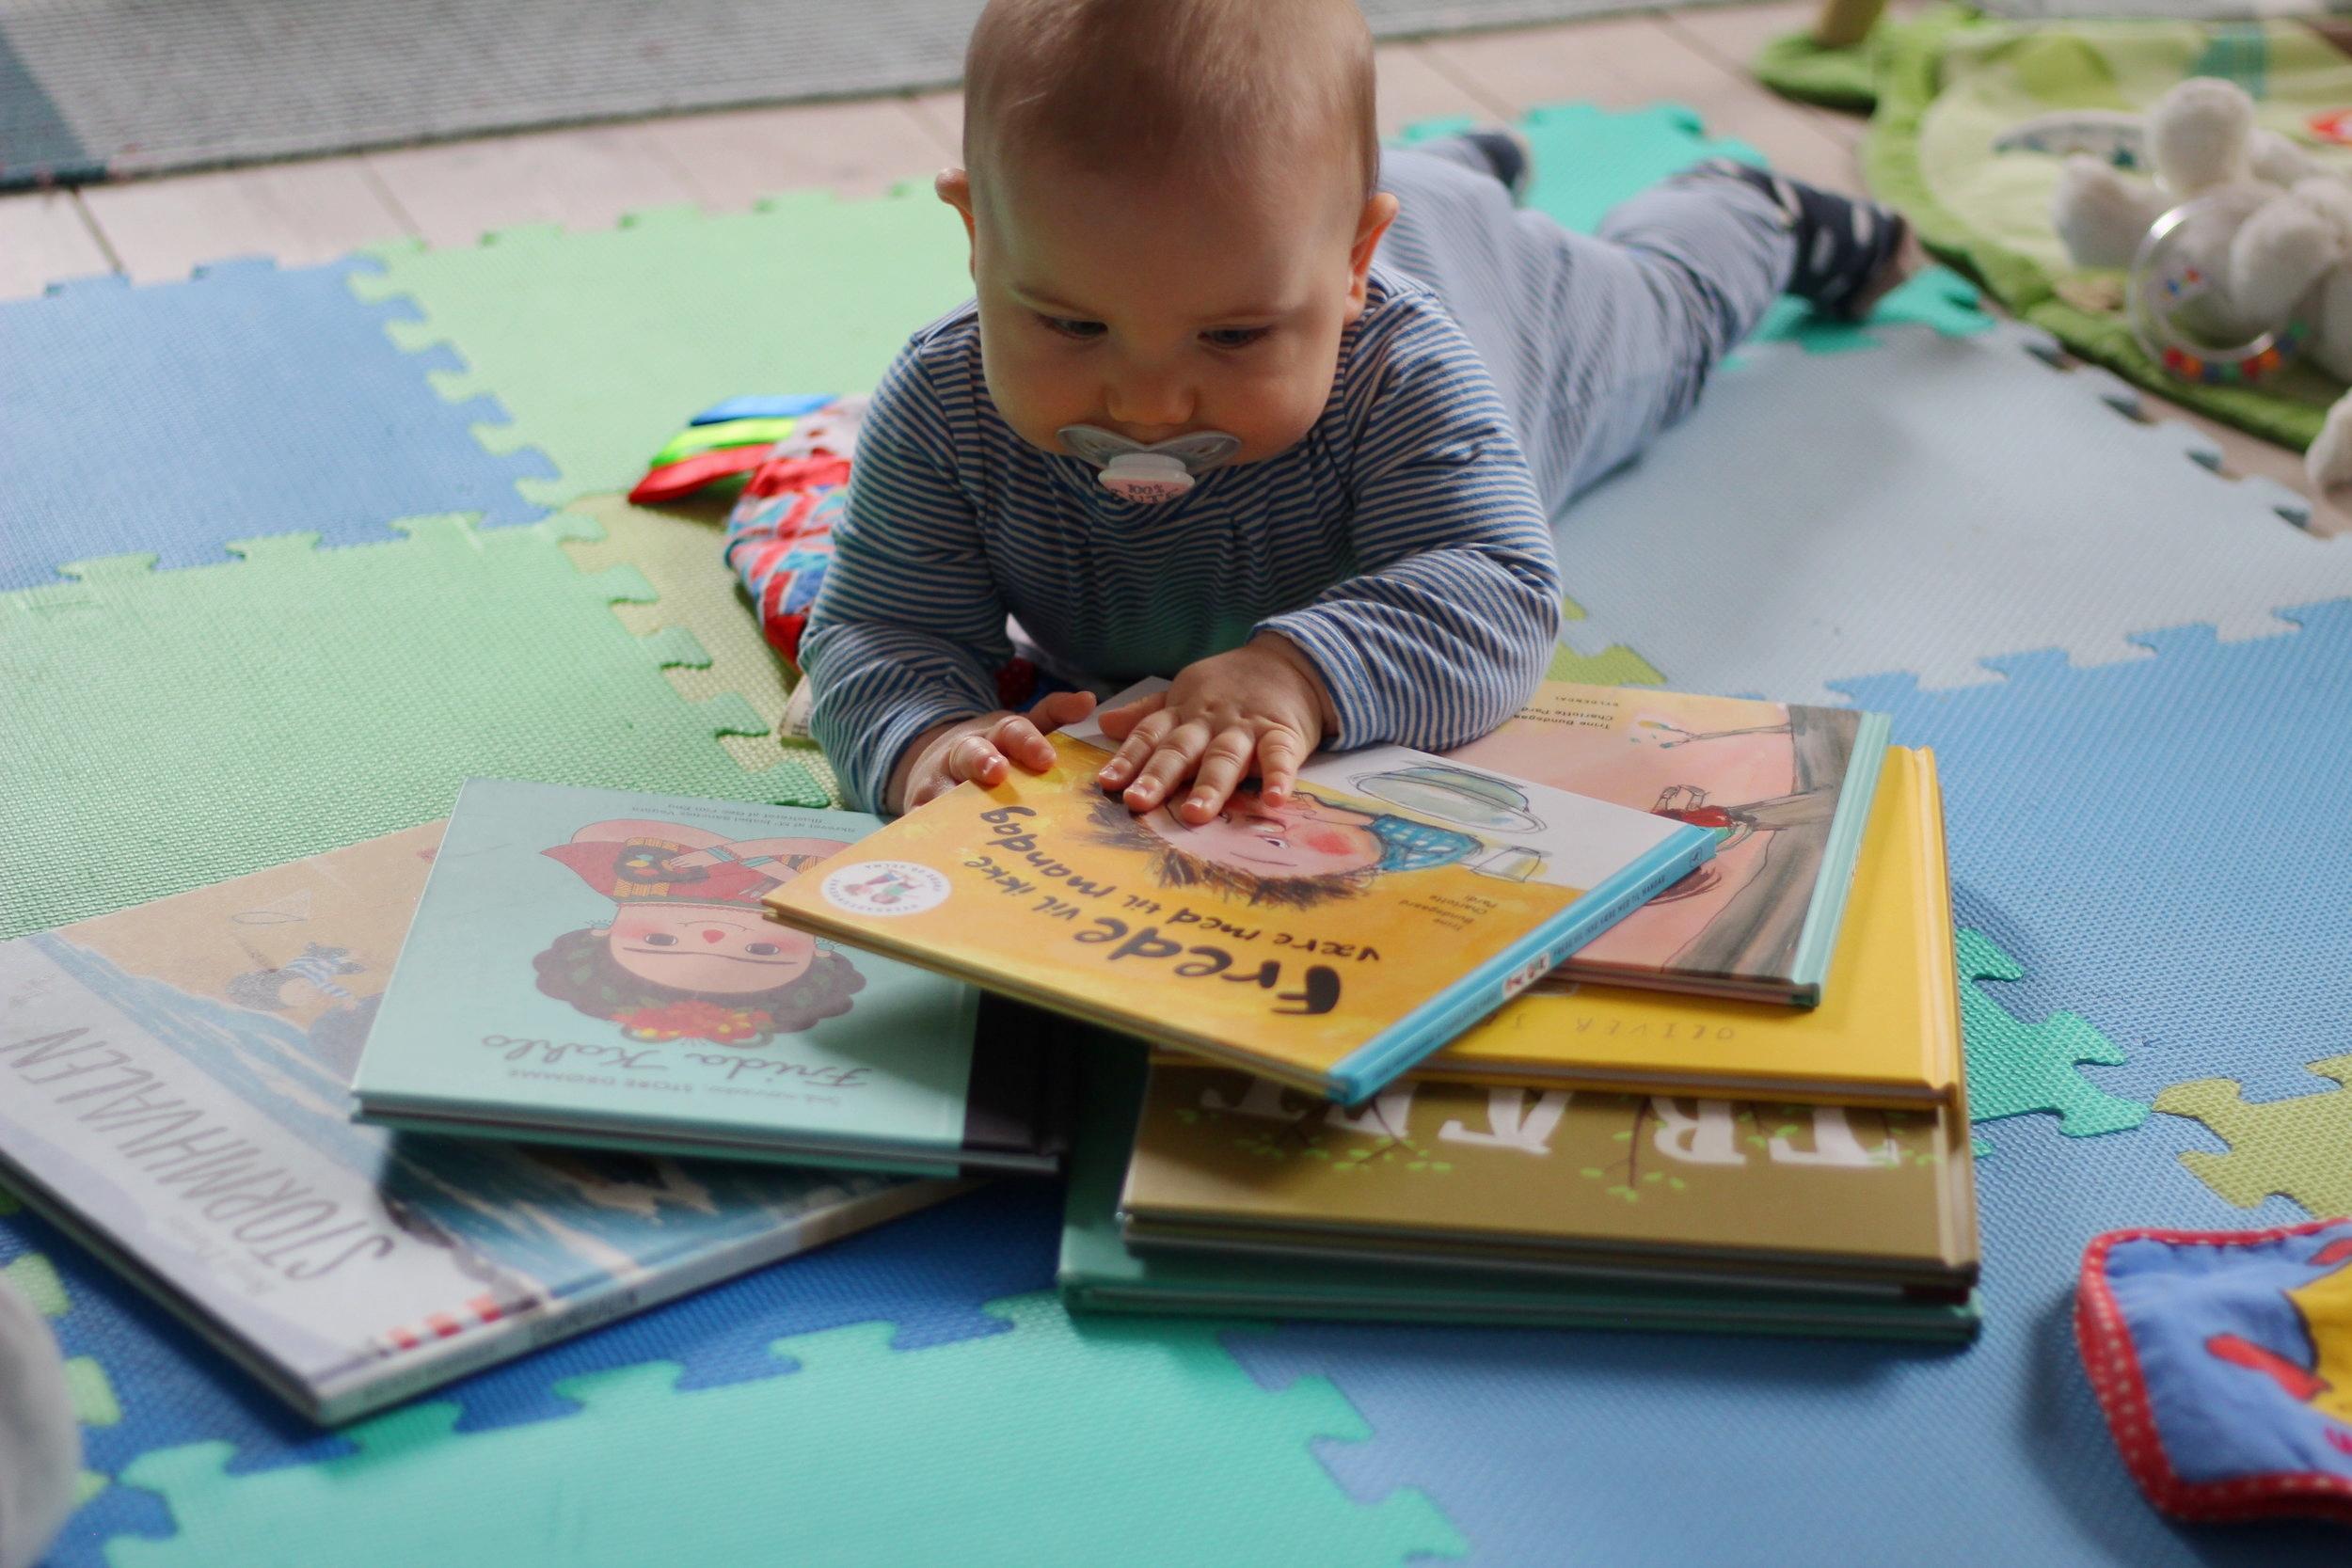 """I'm wondering what to read next."" Matilda said. ""I've finished all the children's books."" - — ROALD DAHL, MATILDA"